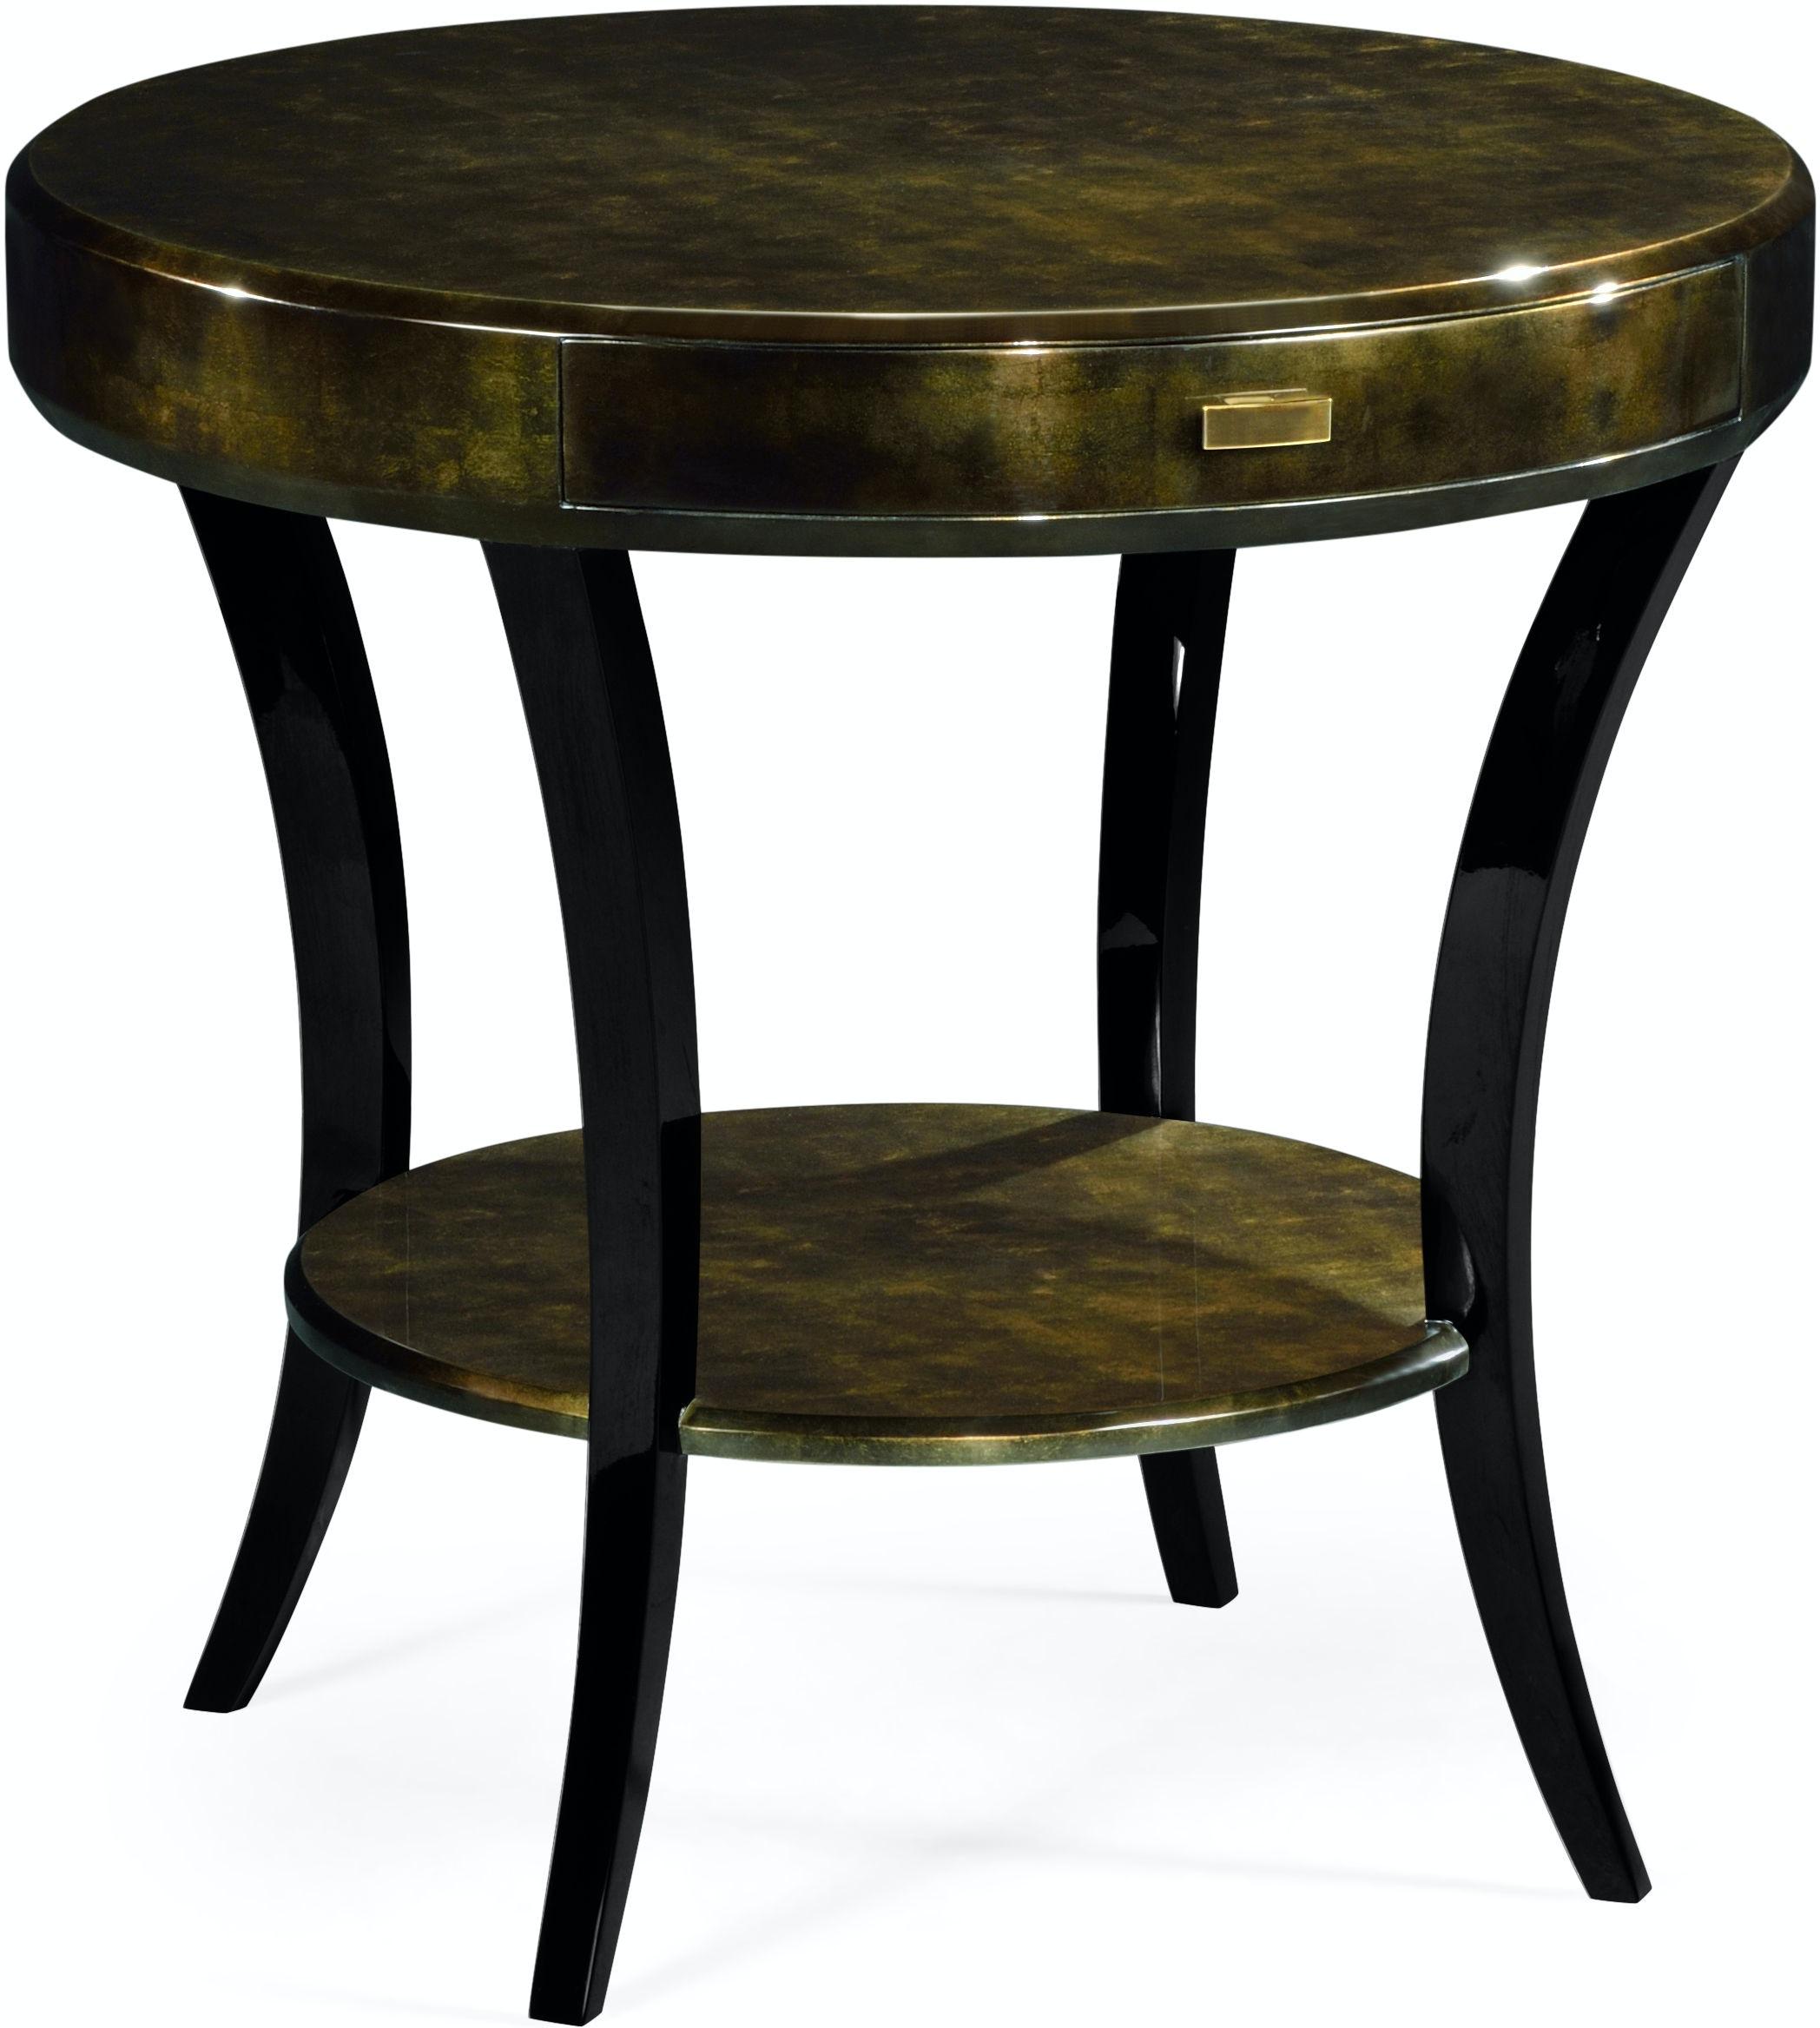 Jonathan Charles Living Room Dark Bronze Round Side Table With Drawer 494000 Mgf Howard Lorton